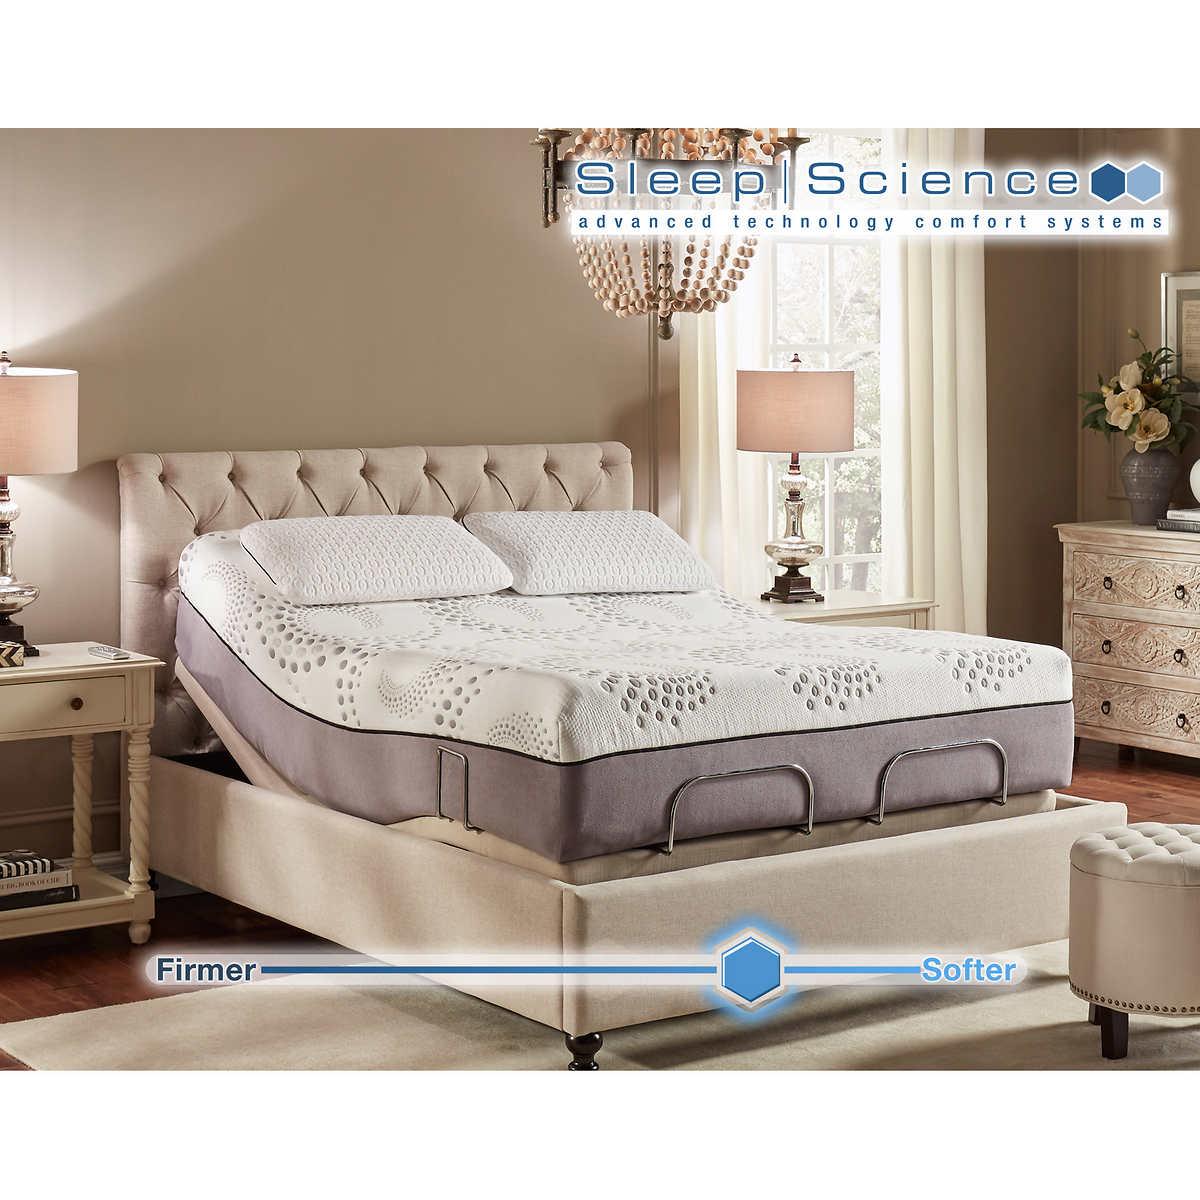 "sleep science ara 13"" queen memory foam mattress with adjustable base"